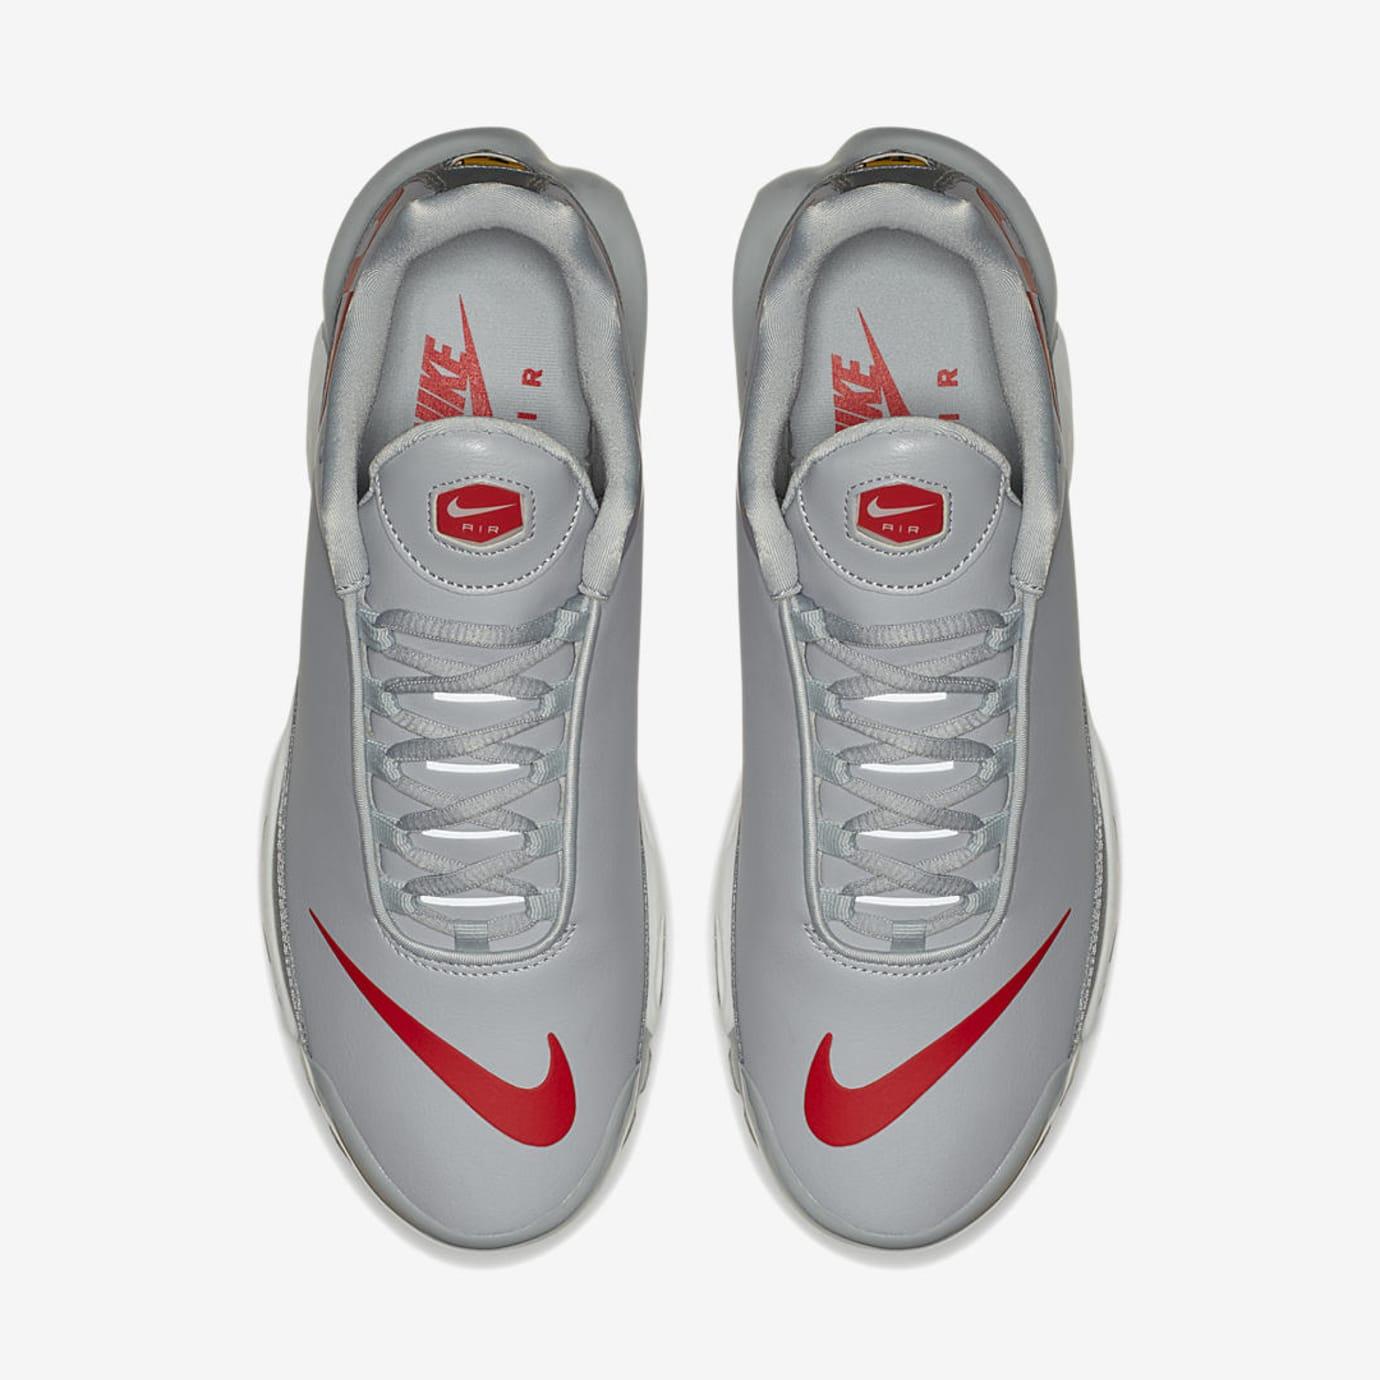 reputable site 65684 1ae0e Image via US11 · Nike Air Max Plus Leather Big Logo  Grey Red  (Top)